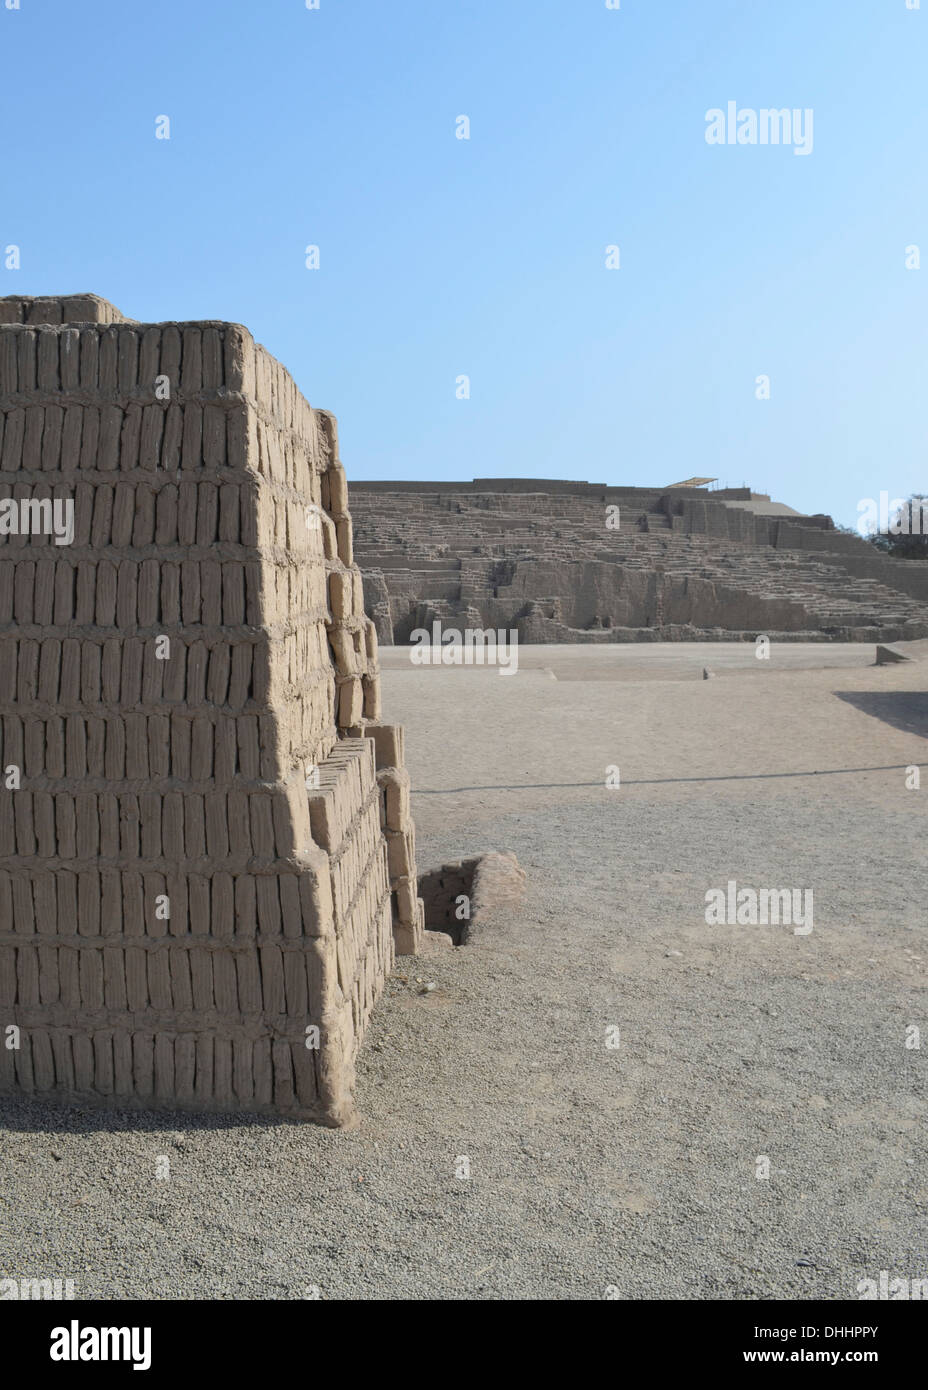 huaca pucllana or huaca juliana a pre inca adobe and clay pyramid